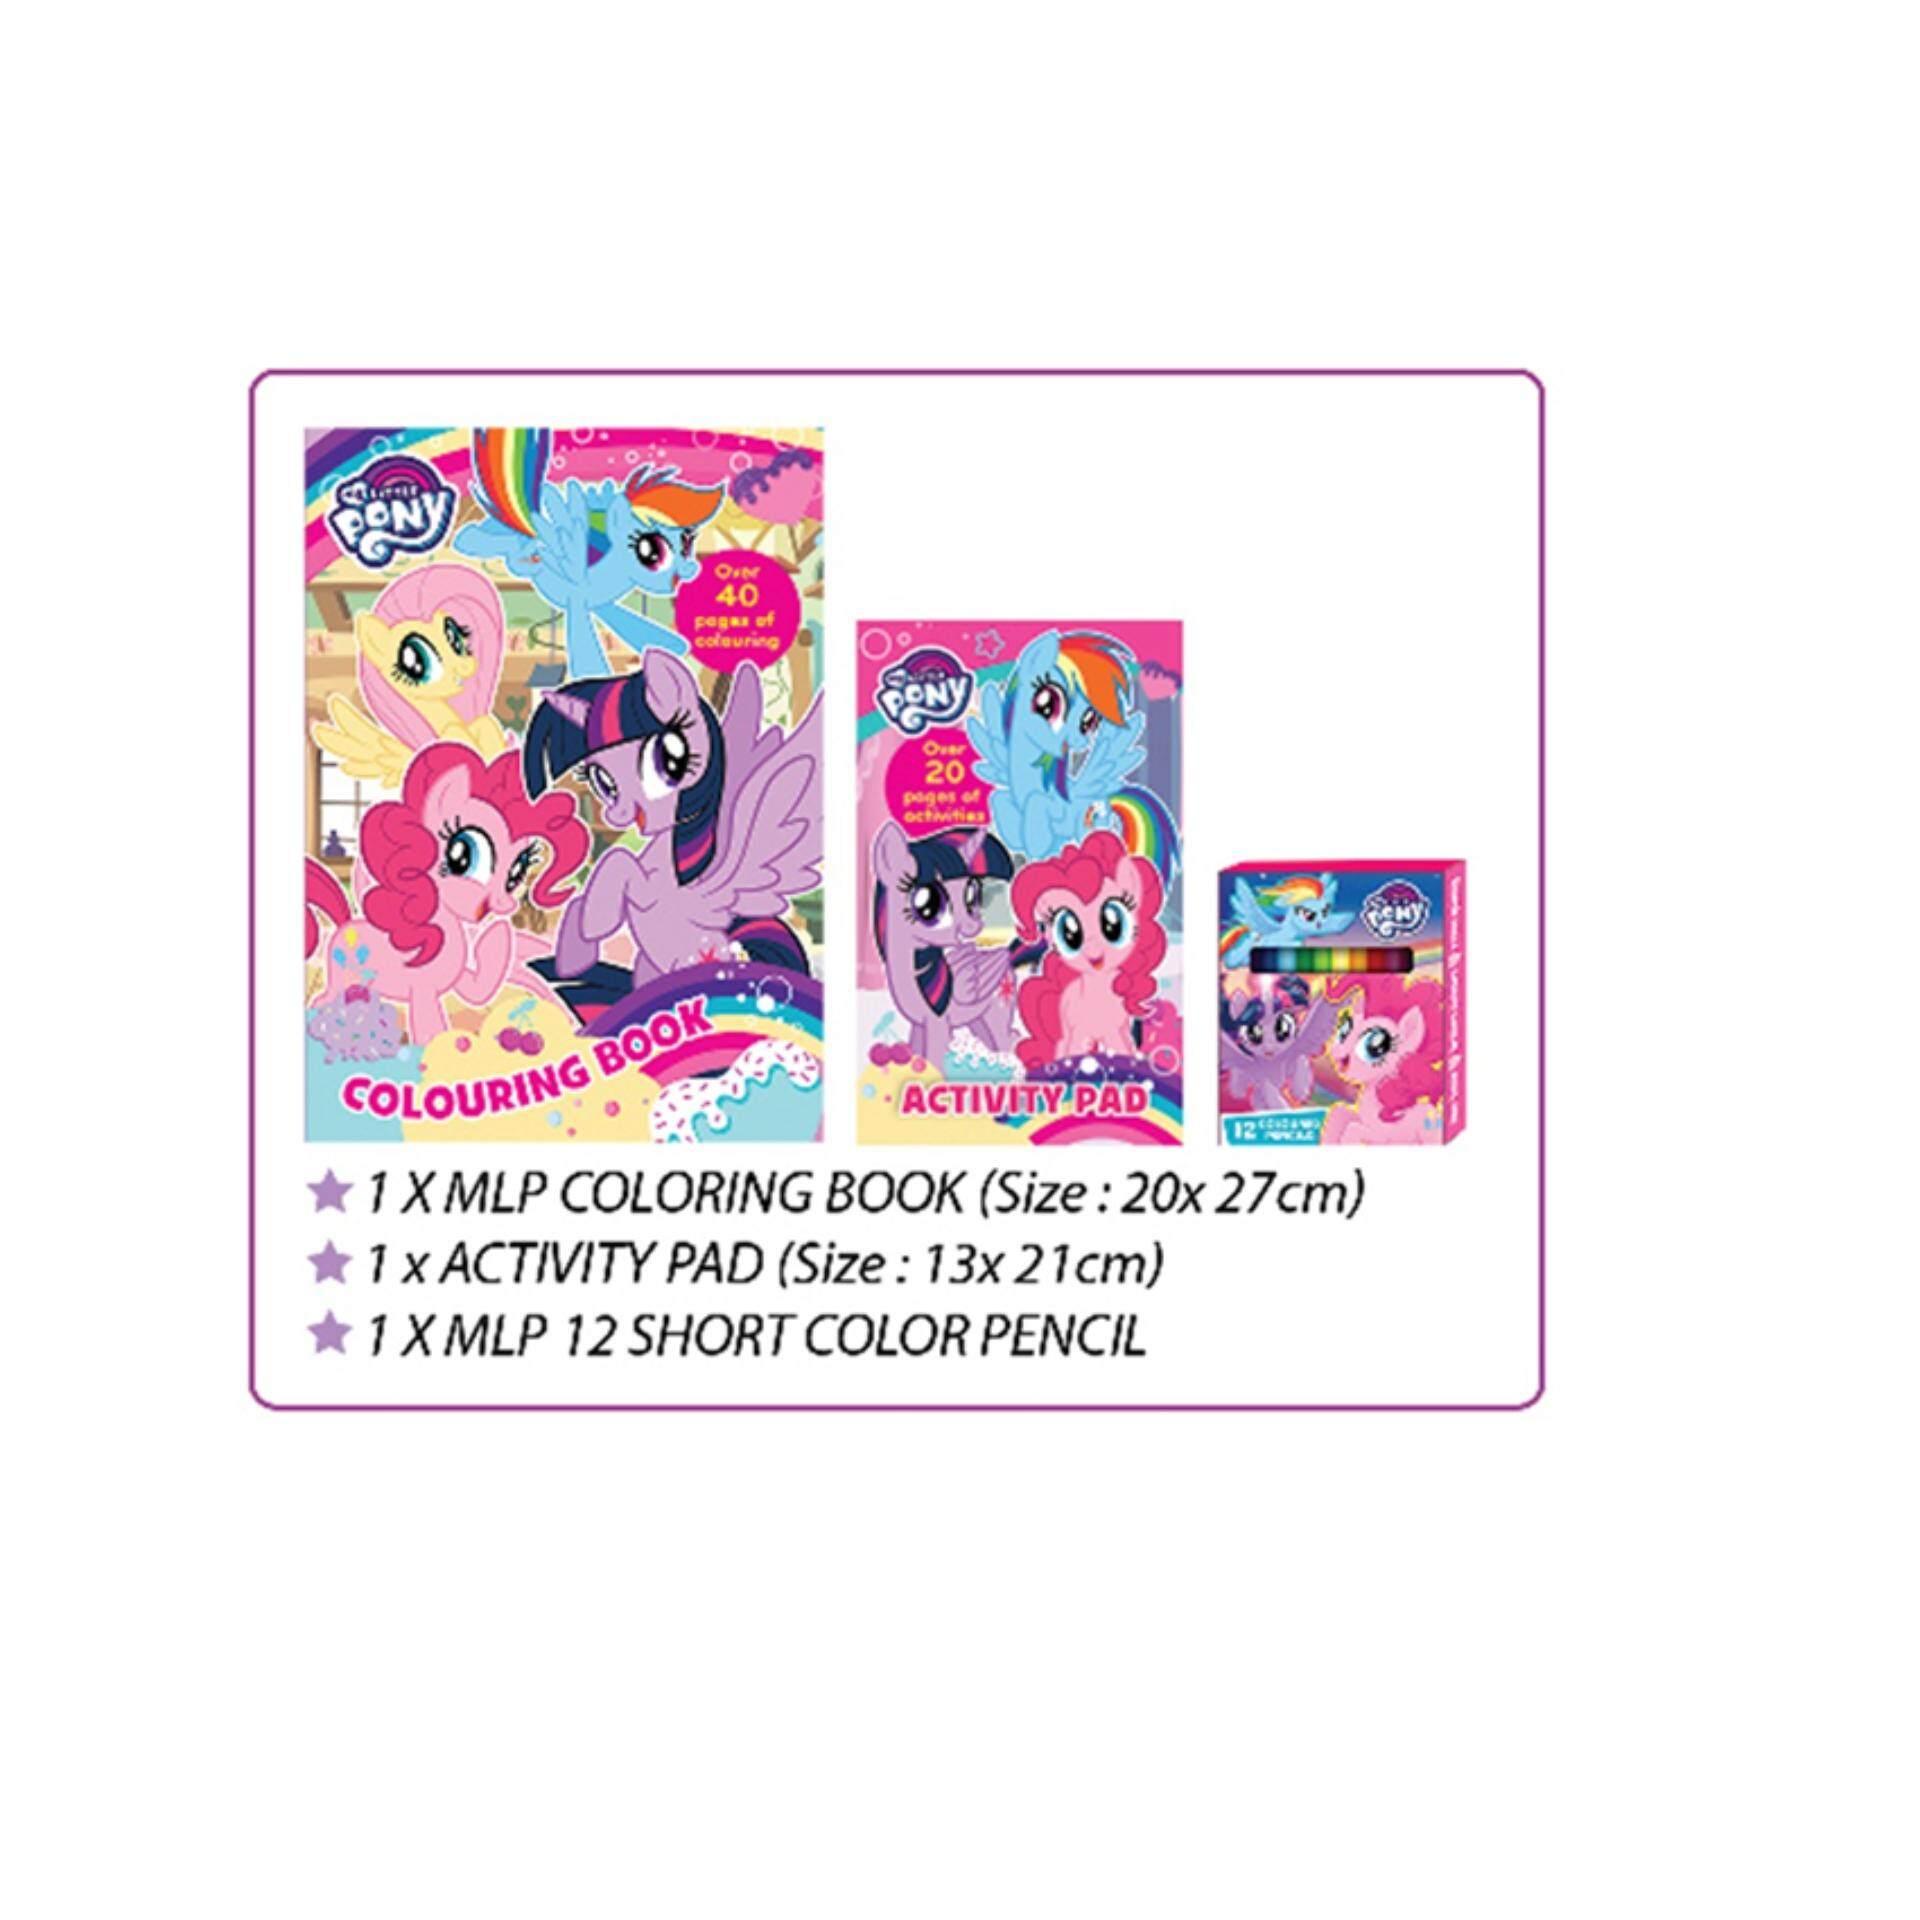 My Little Pony Colouring Book With Activity Pad & 12pcs Colour Pencil Set - Multicolour